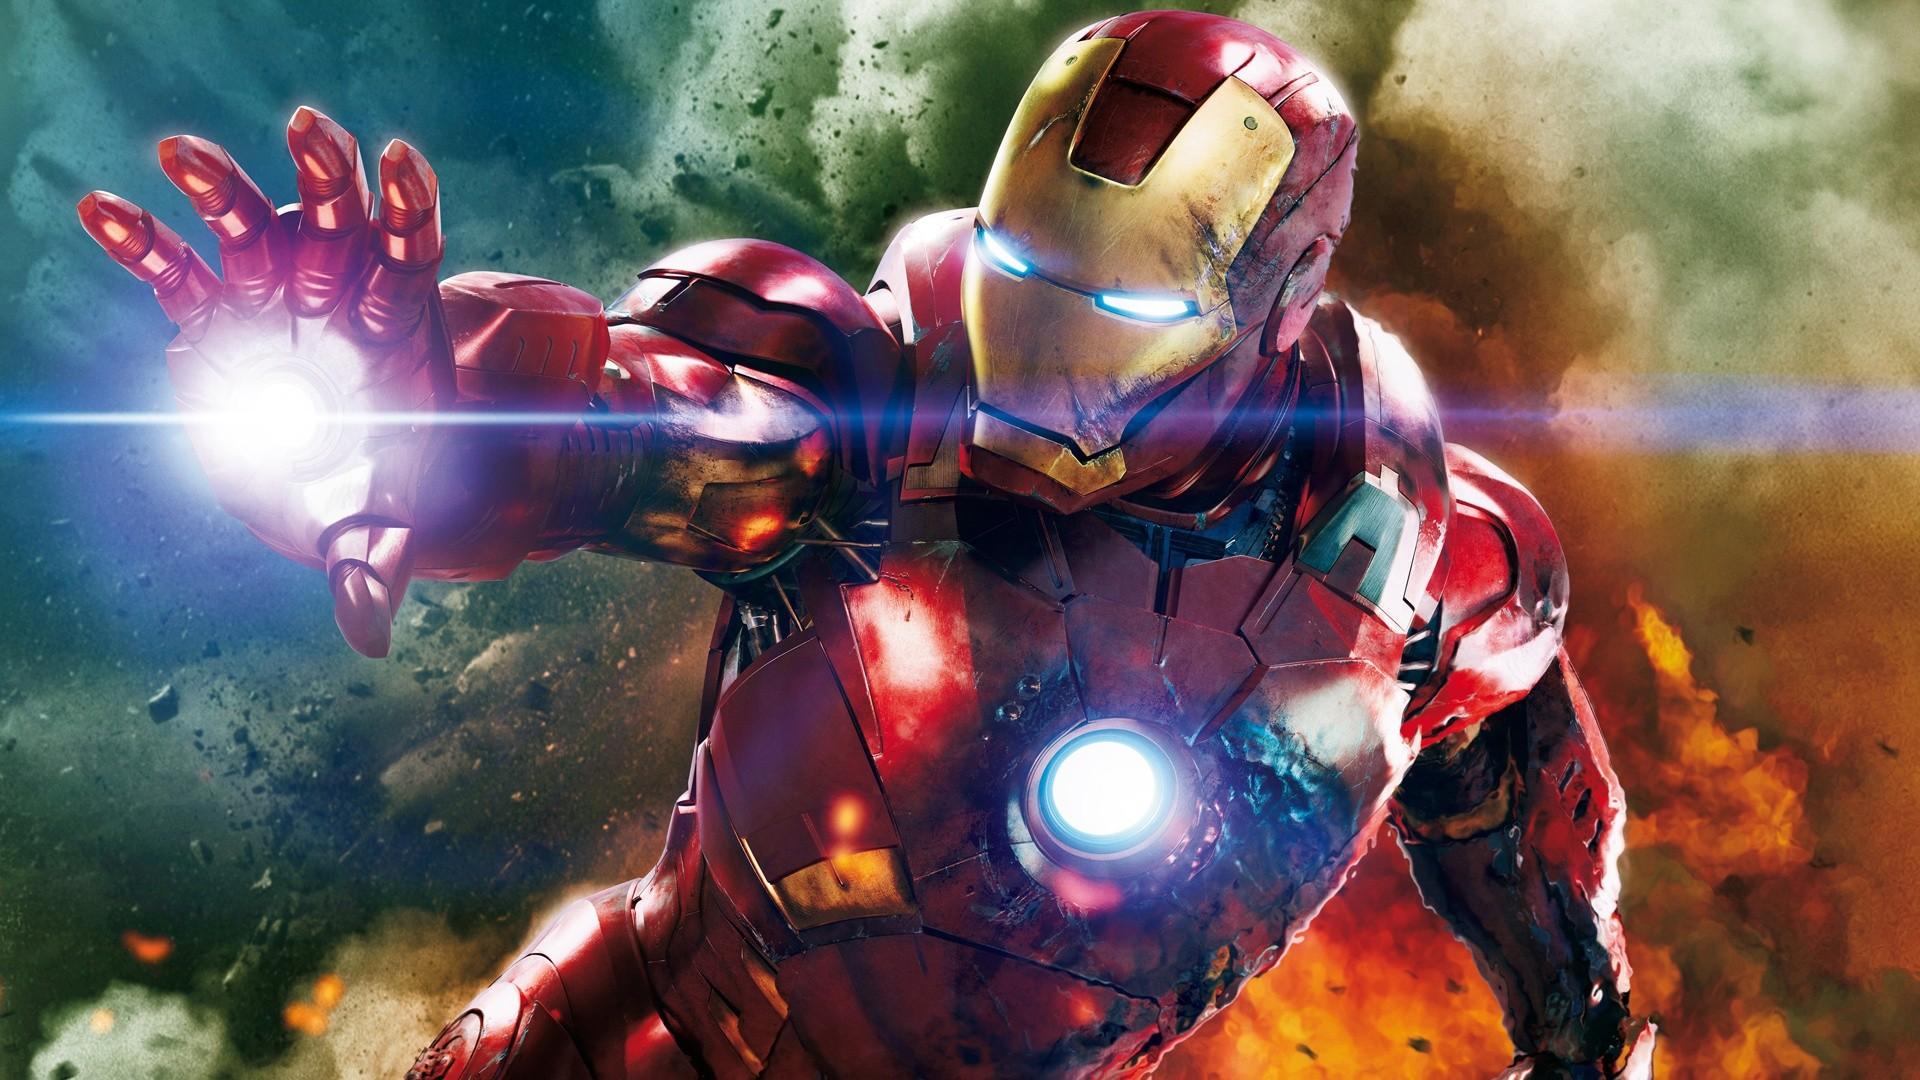 Cool Wallpapers Iron Man 3 HD Wallpaper Cool Wallpapers Iron Man 3 1920x1080